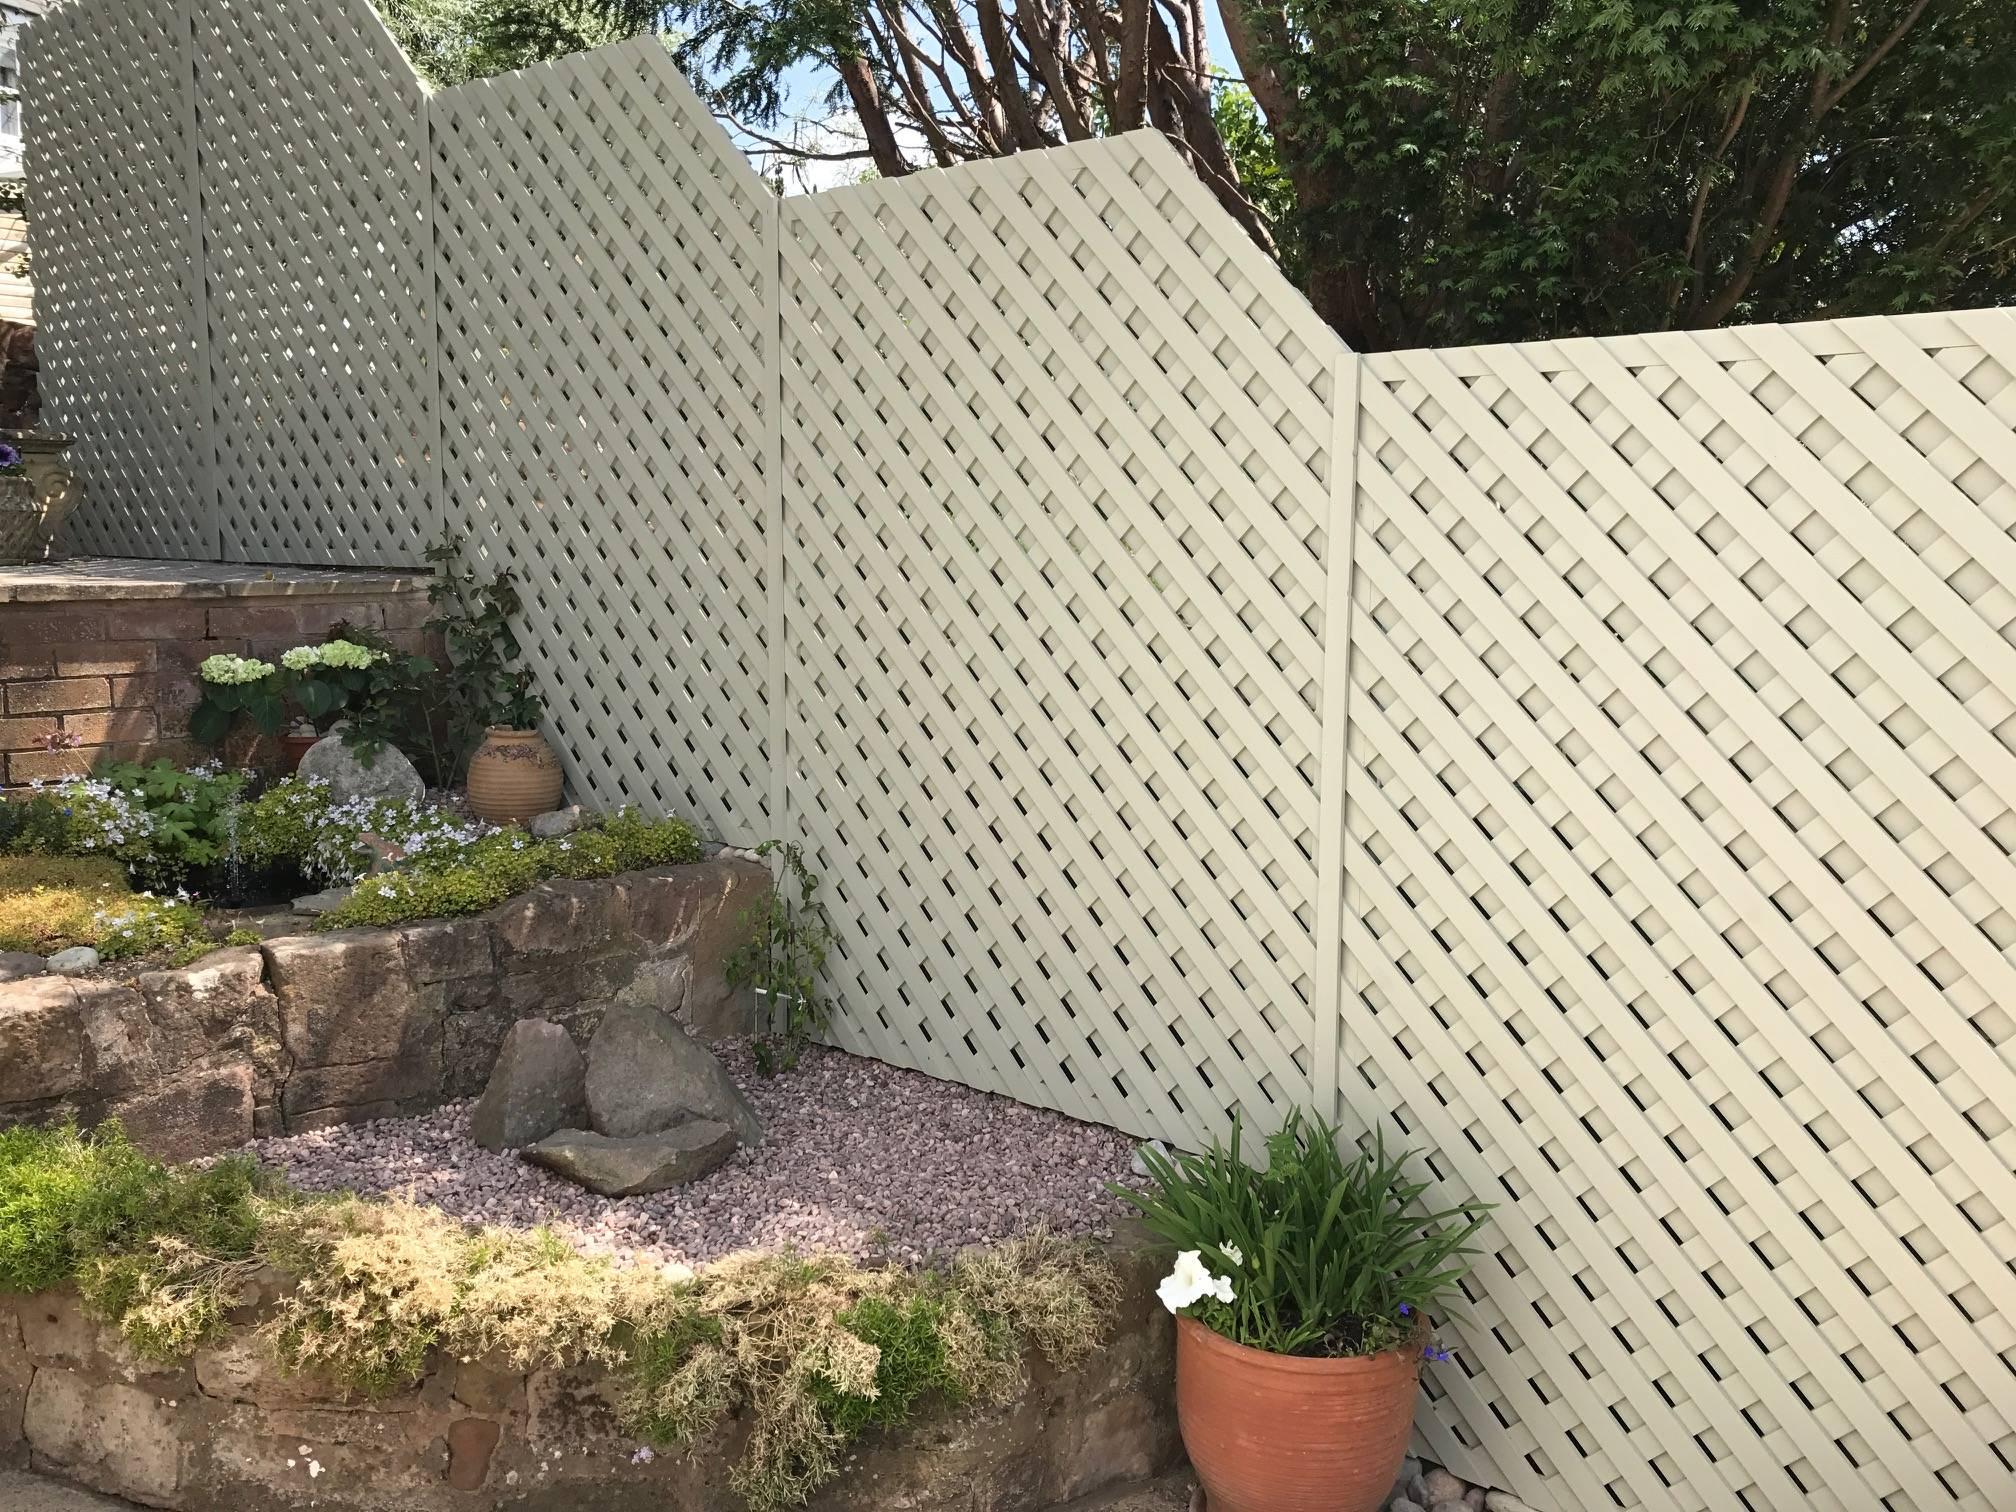 Painted Garden Trellis